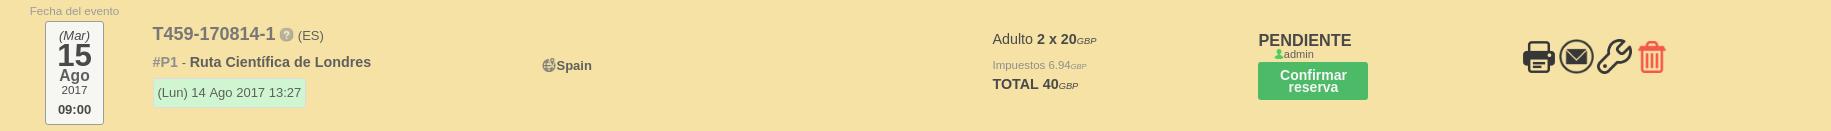 reservas_amarillas.png